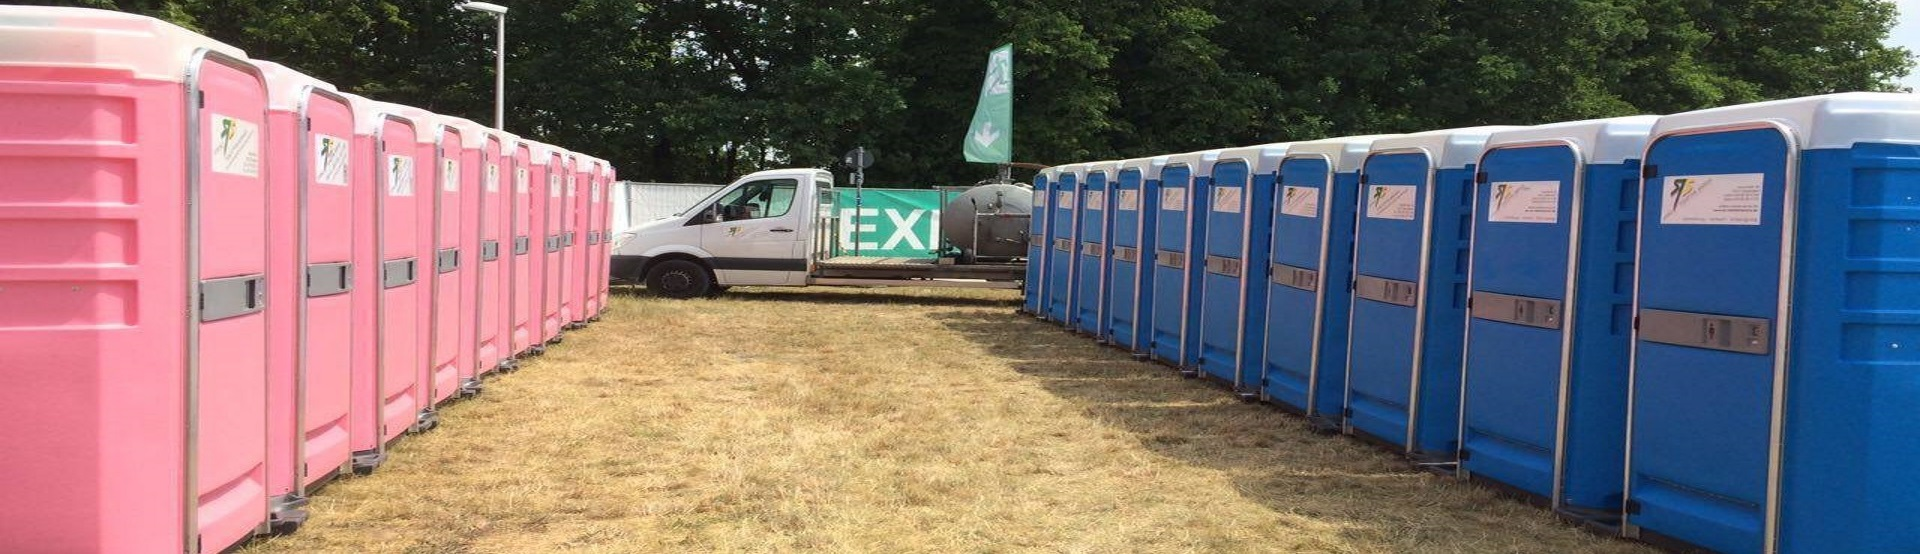 Stenz-Toiletten-Service-Toilettenkabinen-verkauf